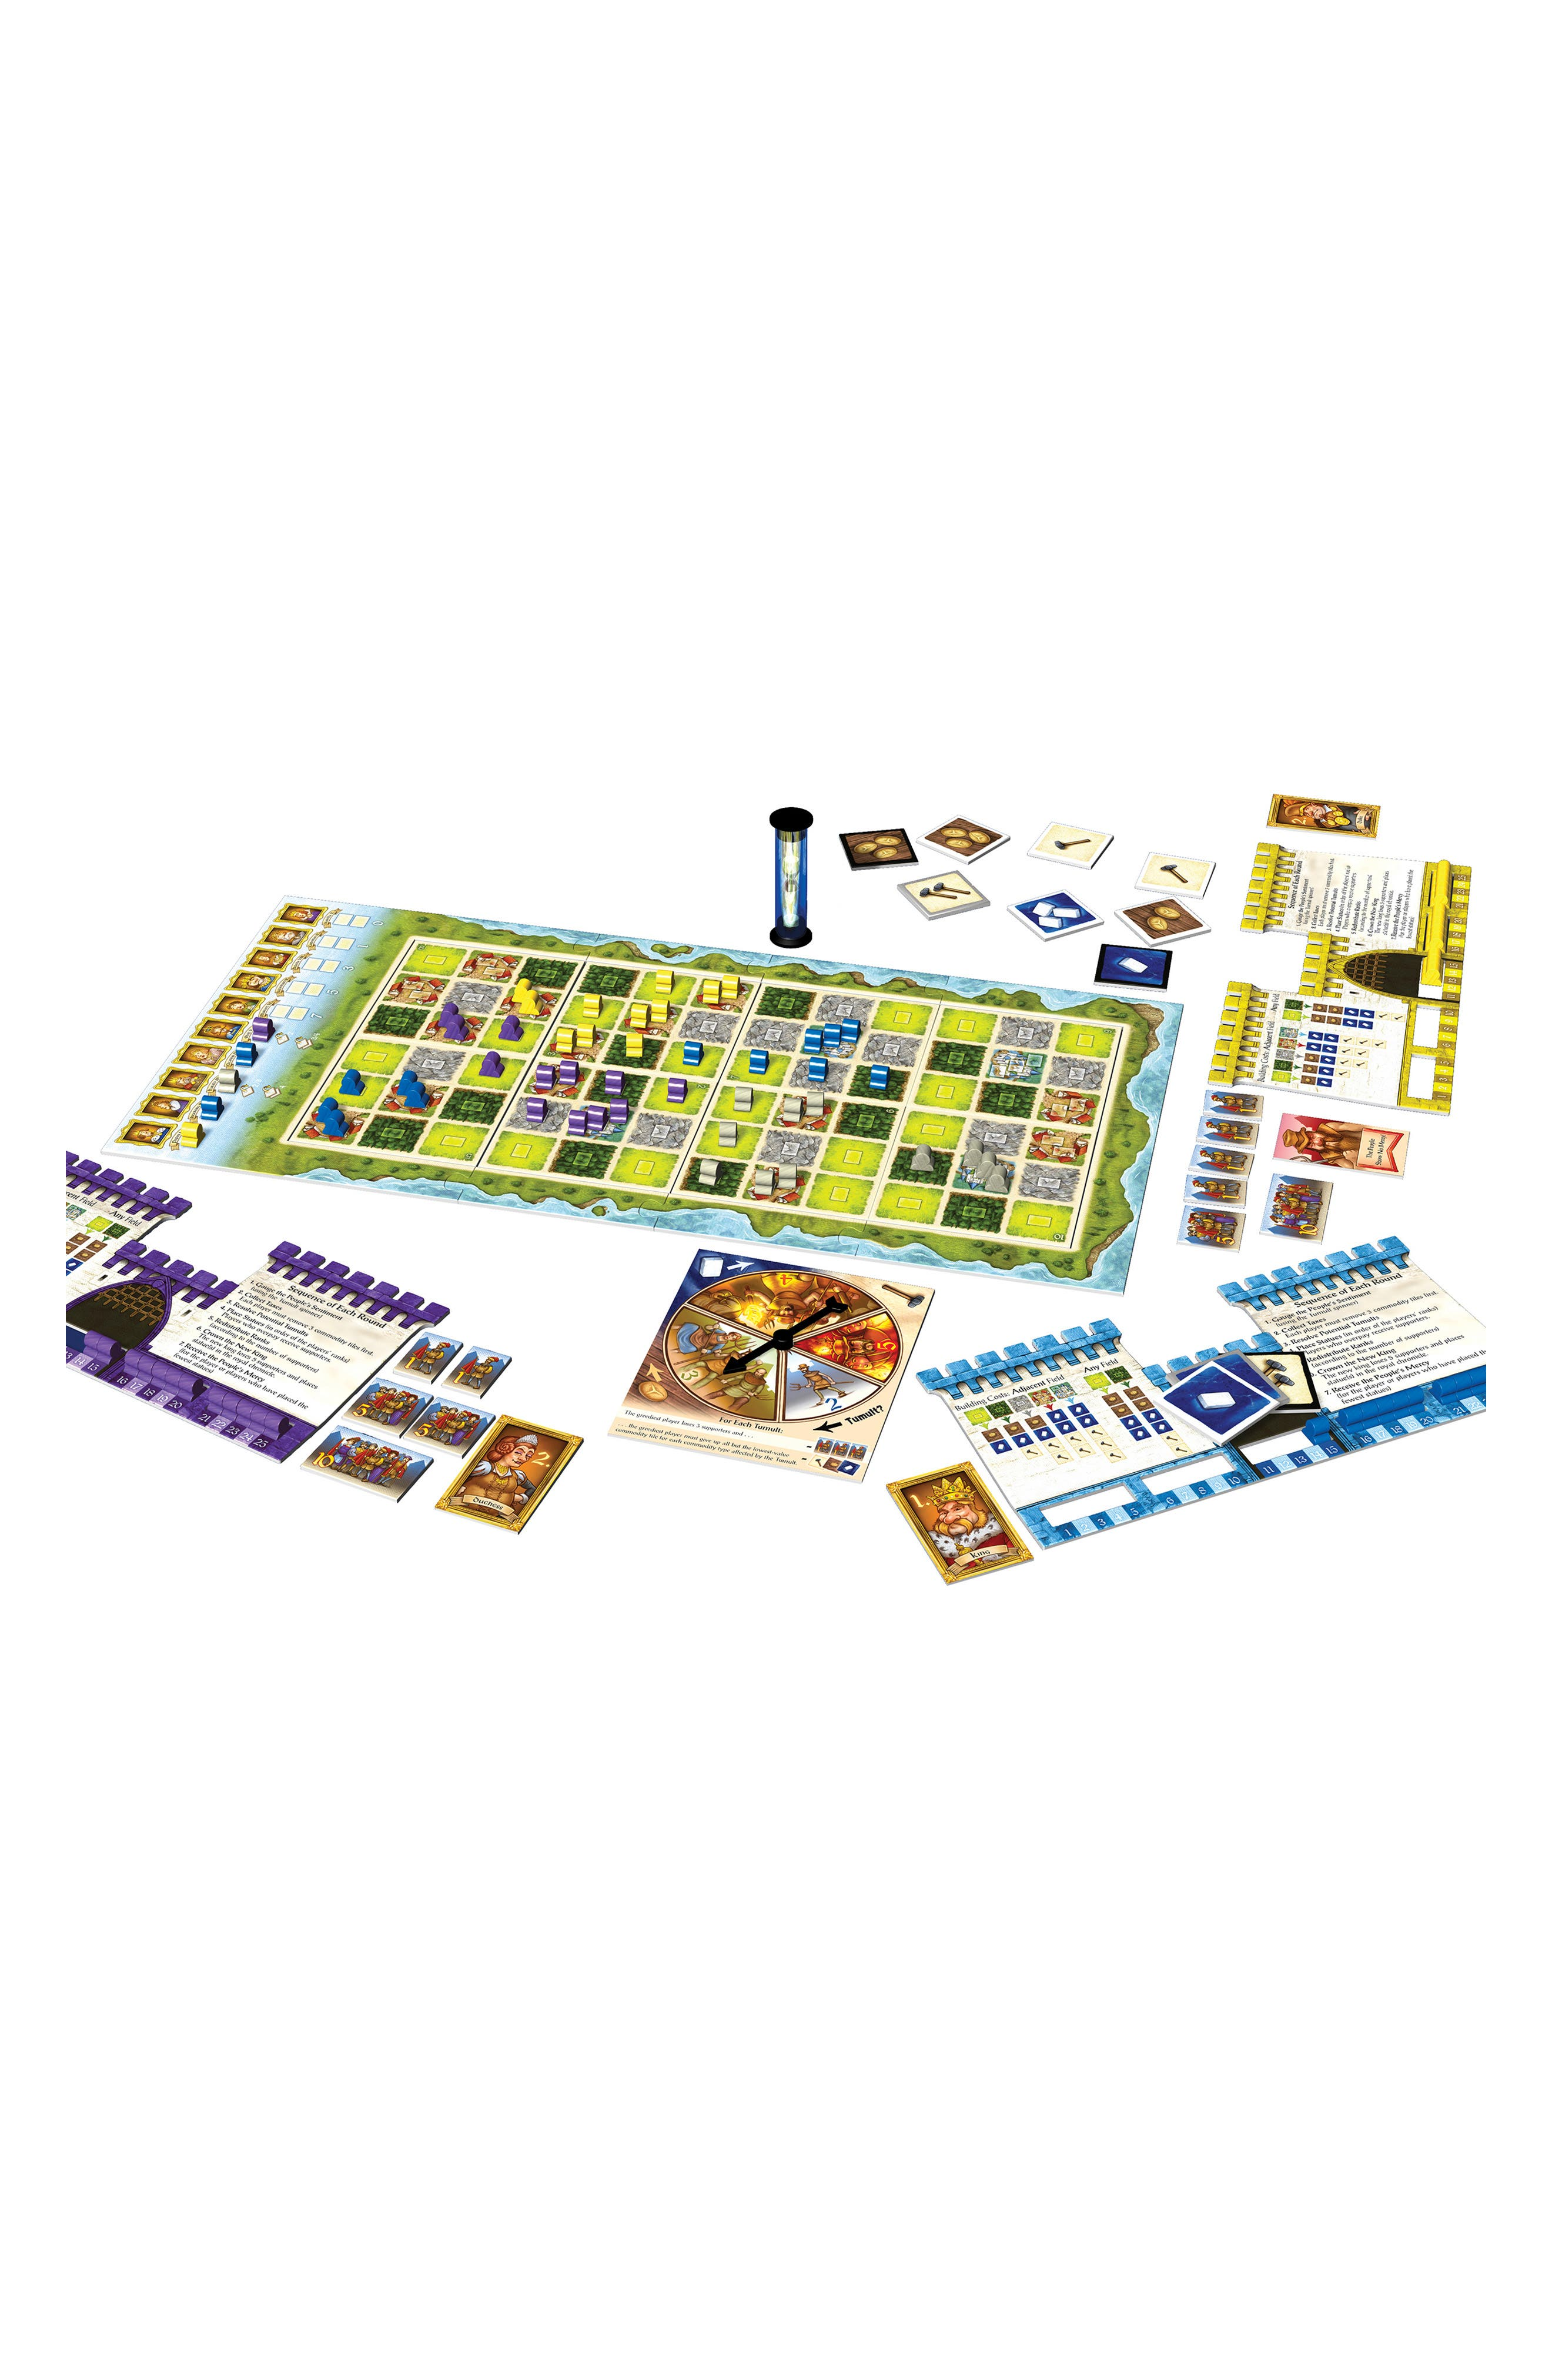 Alternate Image 1 Selected - Thames & Kosmos 'Tumult Royale' Board Game